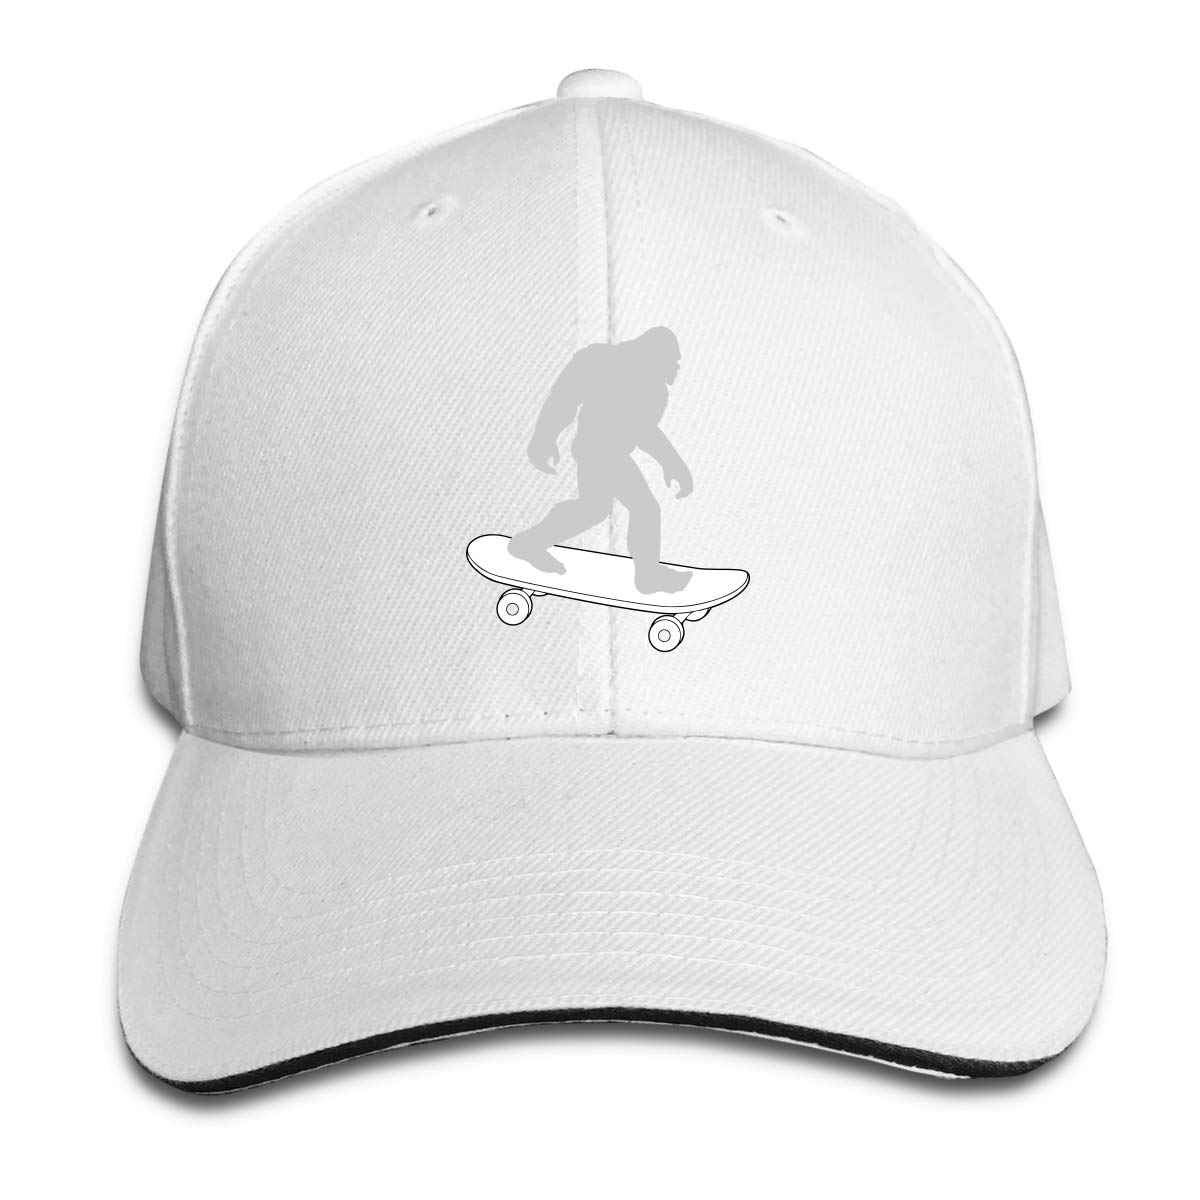 WFIRE Adult Baseball Caps Bigfoot Skateboard Custom Adjustable Sandwich Cap Casquette Hats